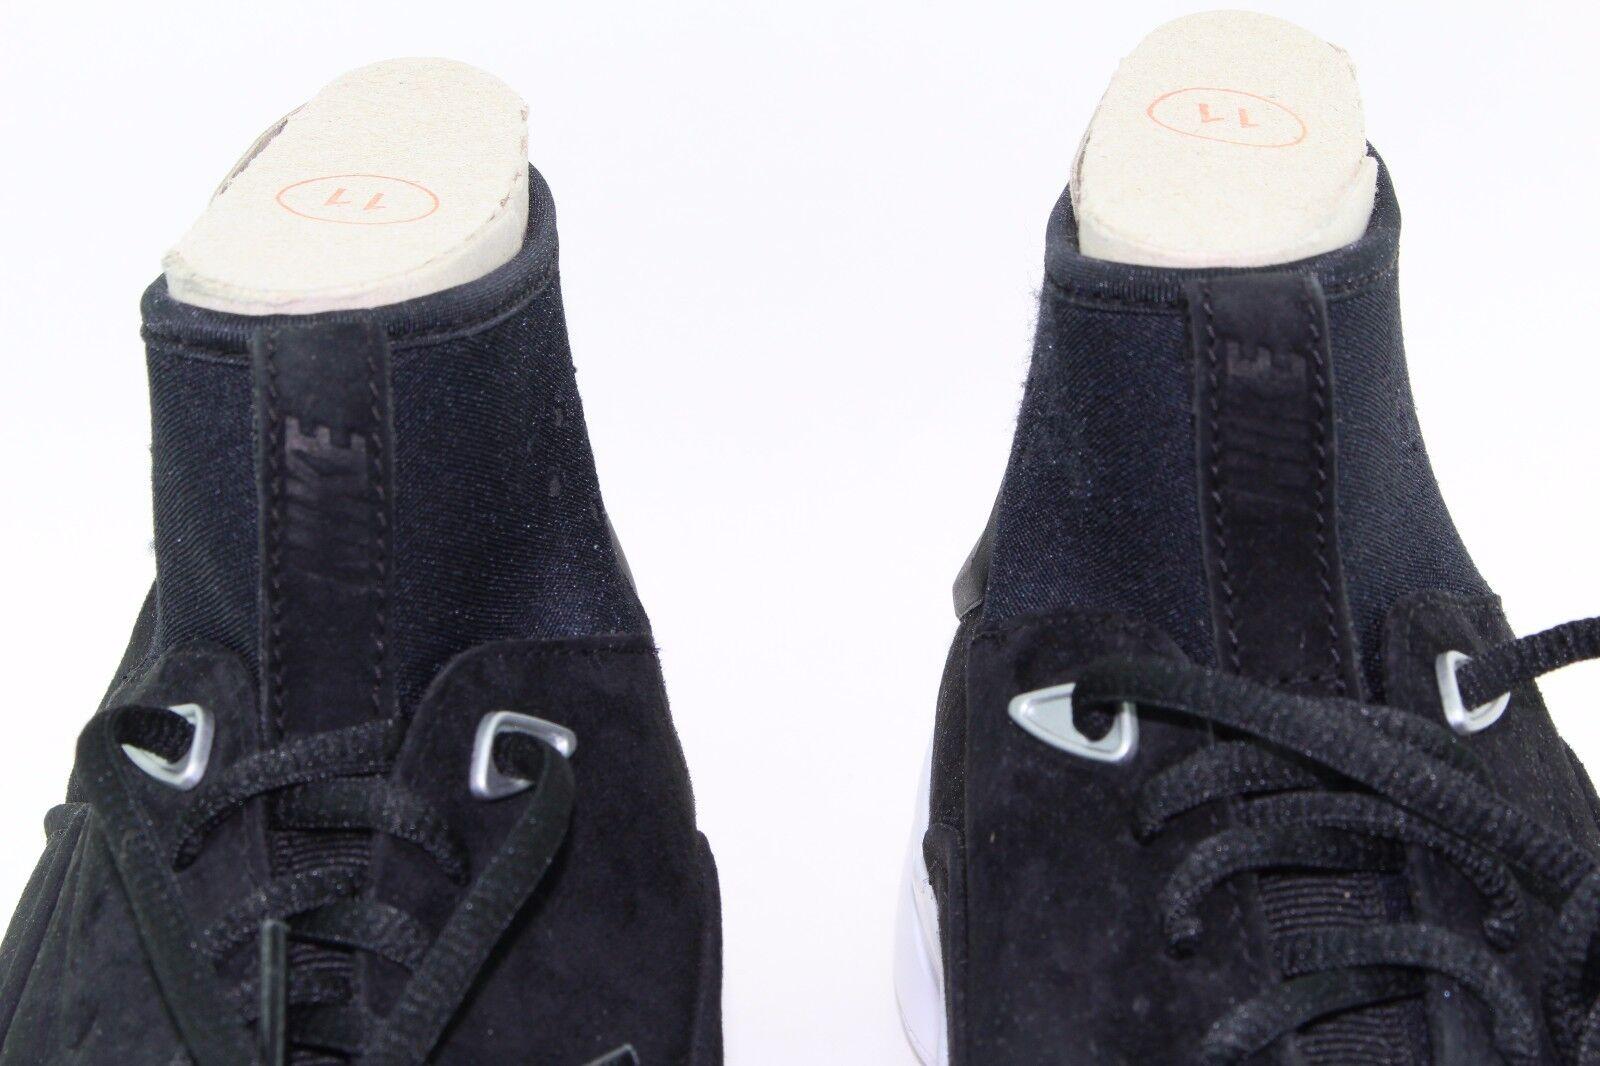 Nike hyperdunk hyperdunk hyperdunk basso lux neri taglia 14 nuove rare autentico basket | Fashionable  | Gentiluomo/Signora Scarpa  827b20